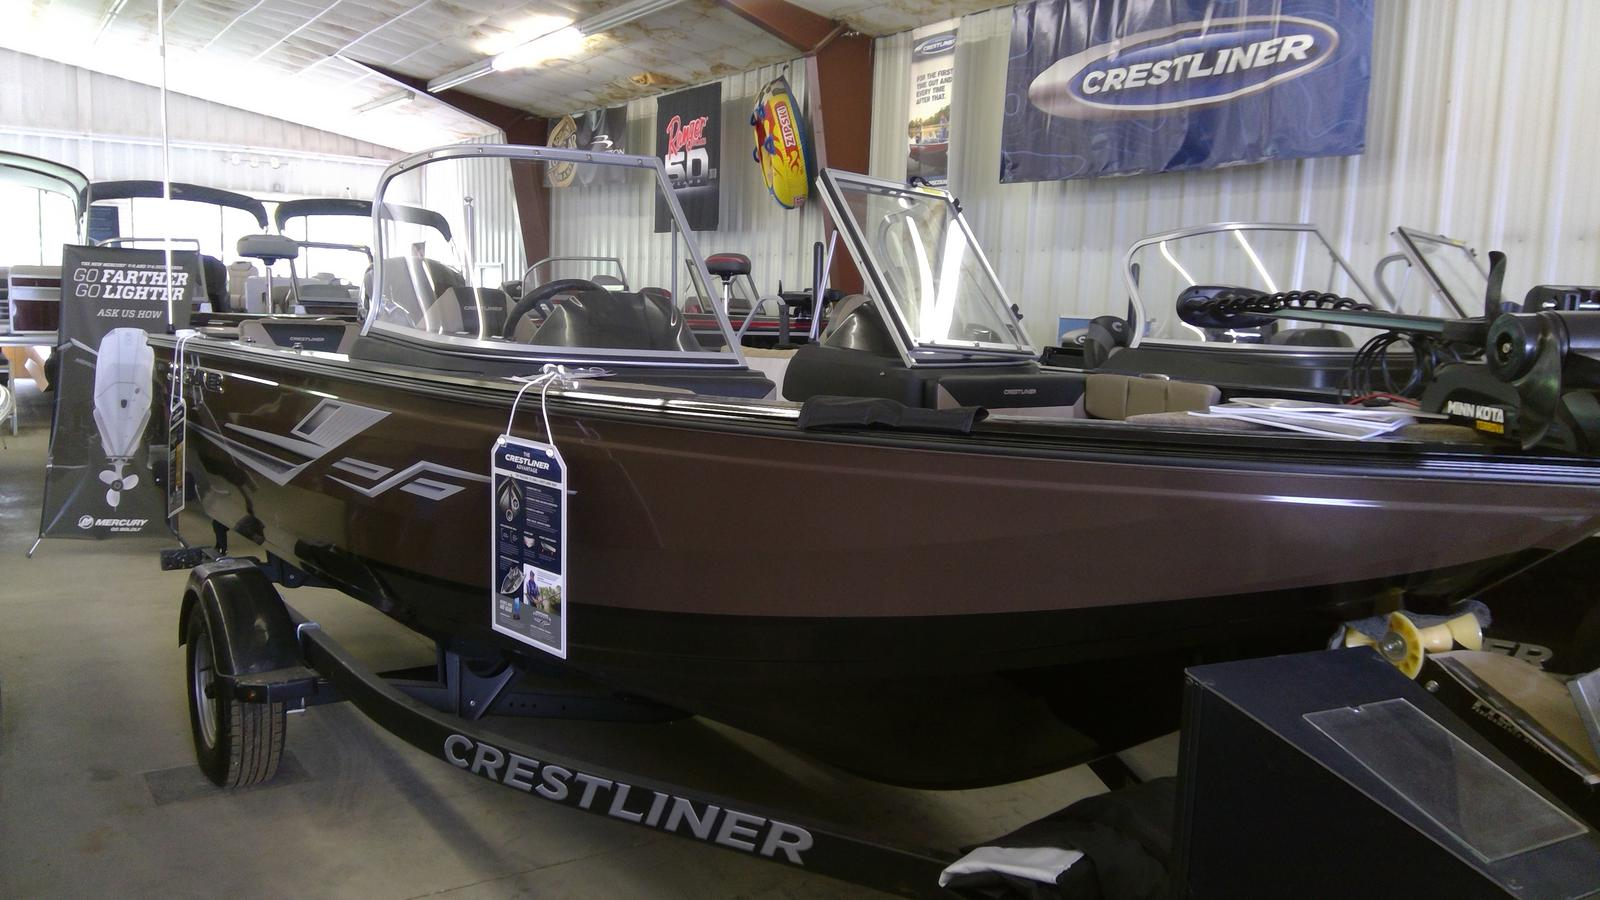 Inventory from Crestliner and Yamaha Quam's Marine & Motor Sports